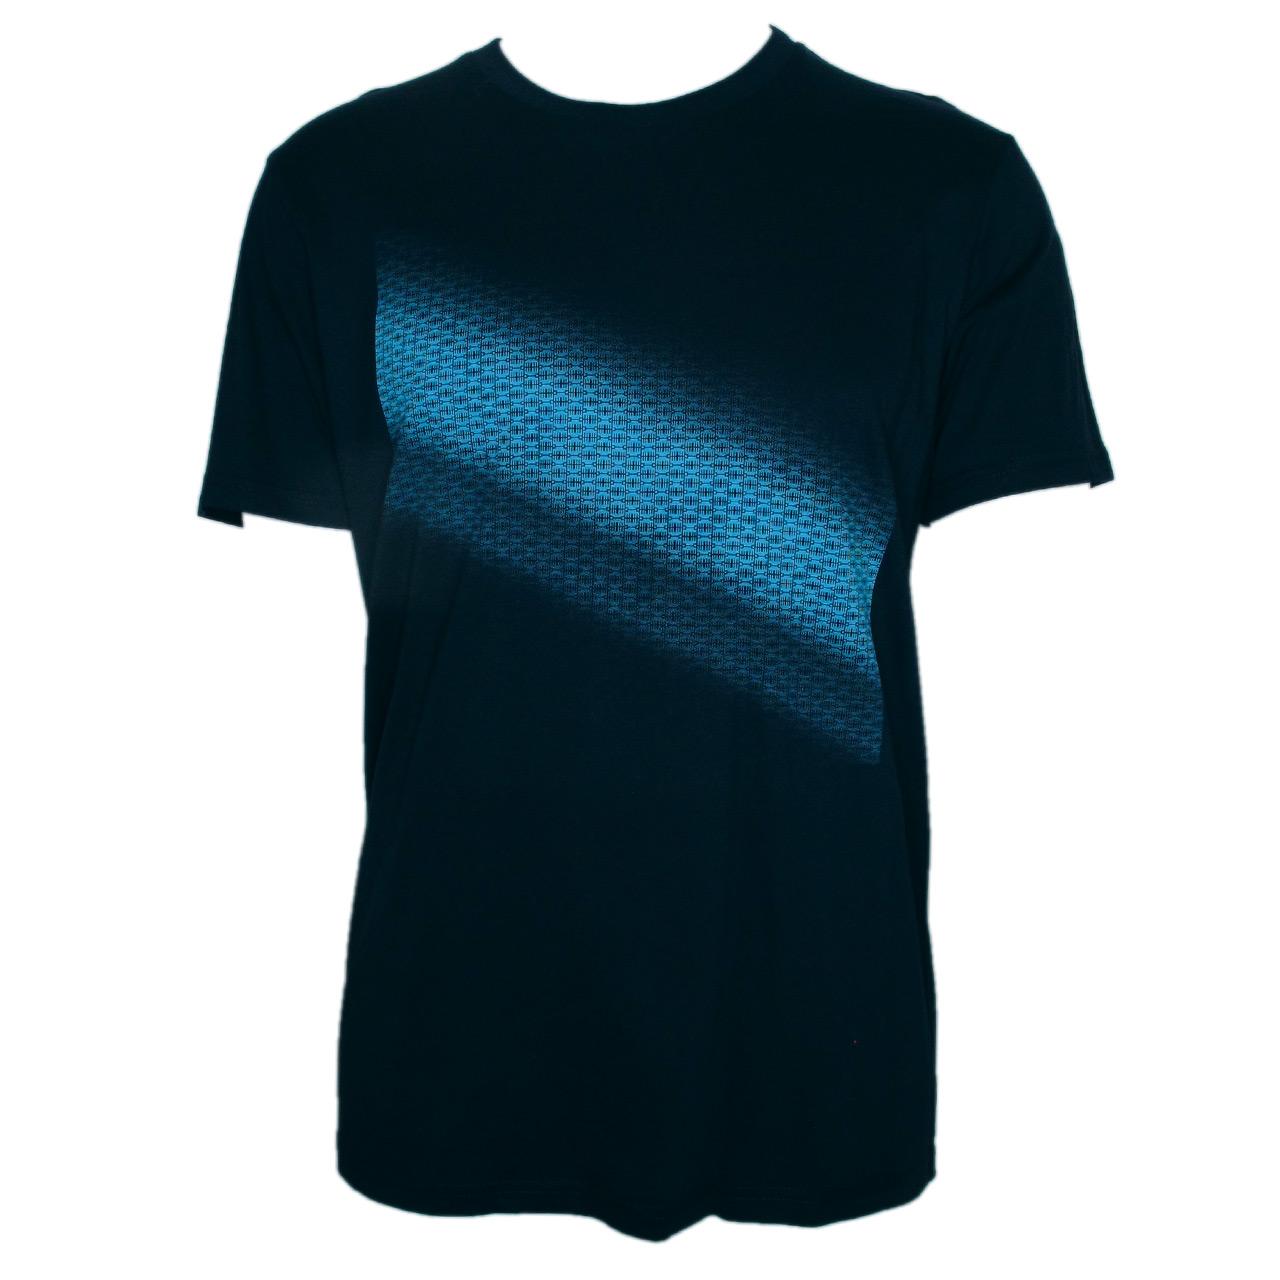 Berlin Design T-Shirt Farbverlauf men marineblau/blau